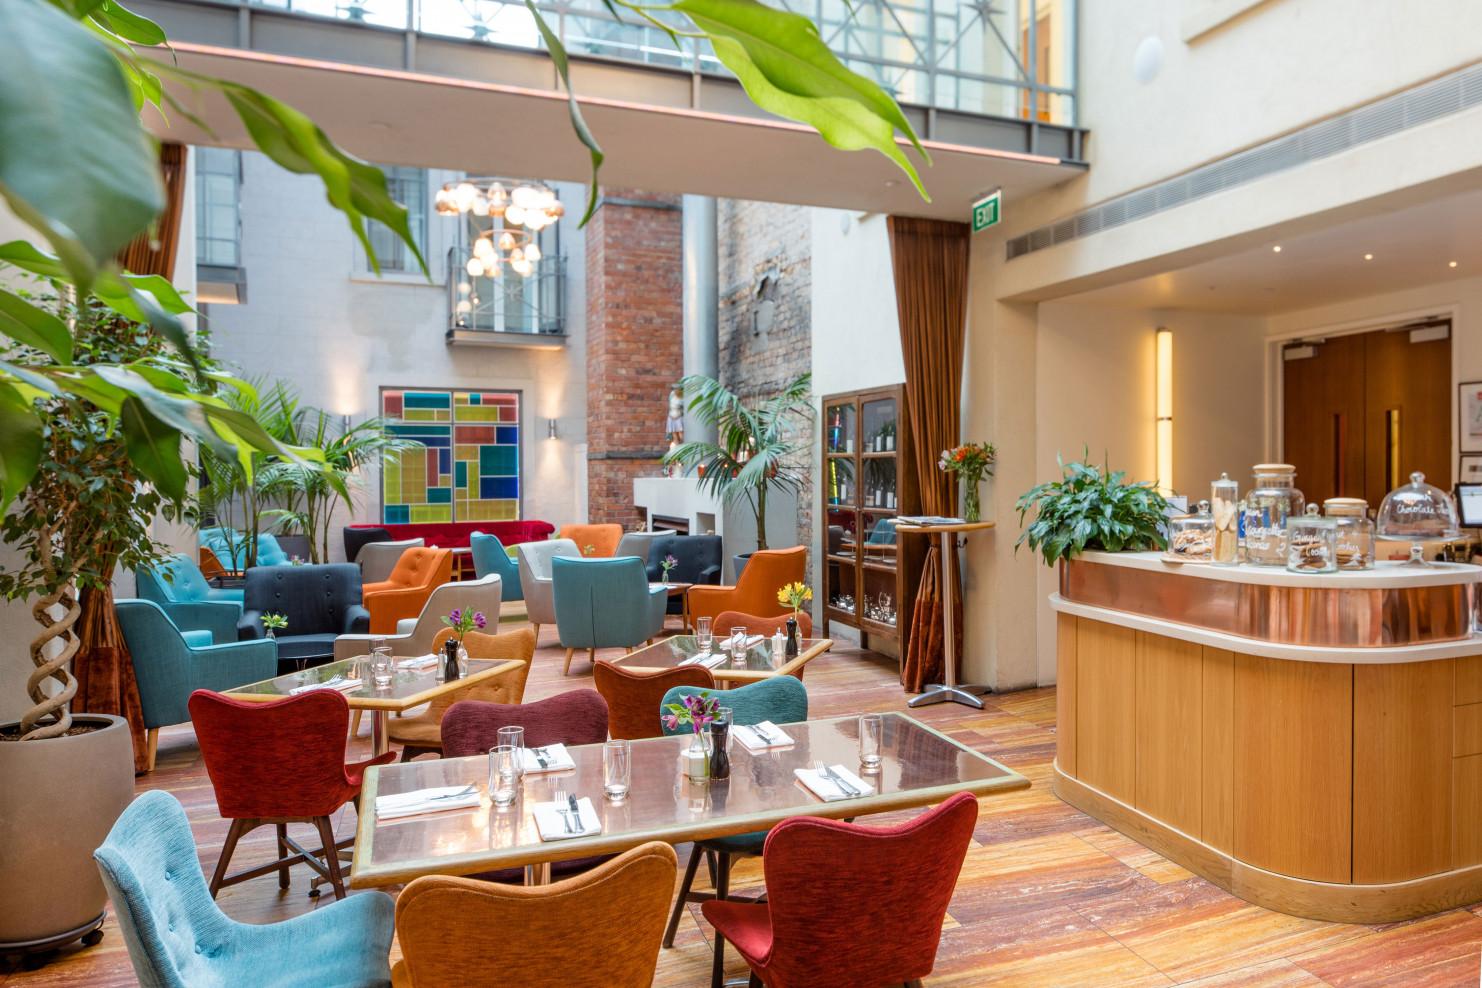 Mr And Mrs Smith Kitchen hotel debrett hotel | central auckland, auckland | north